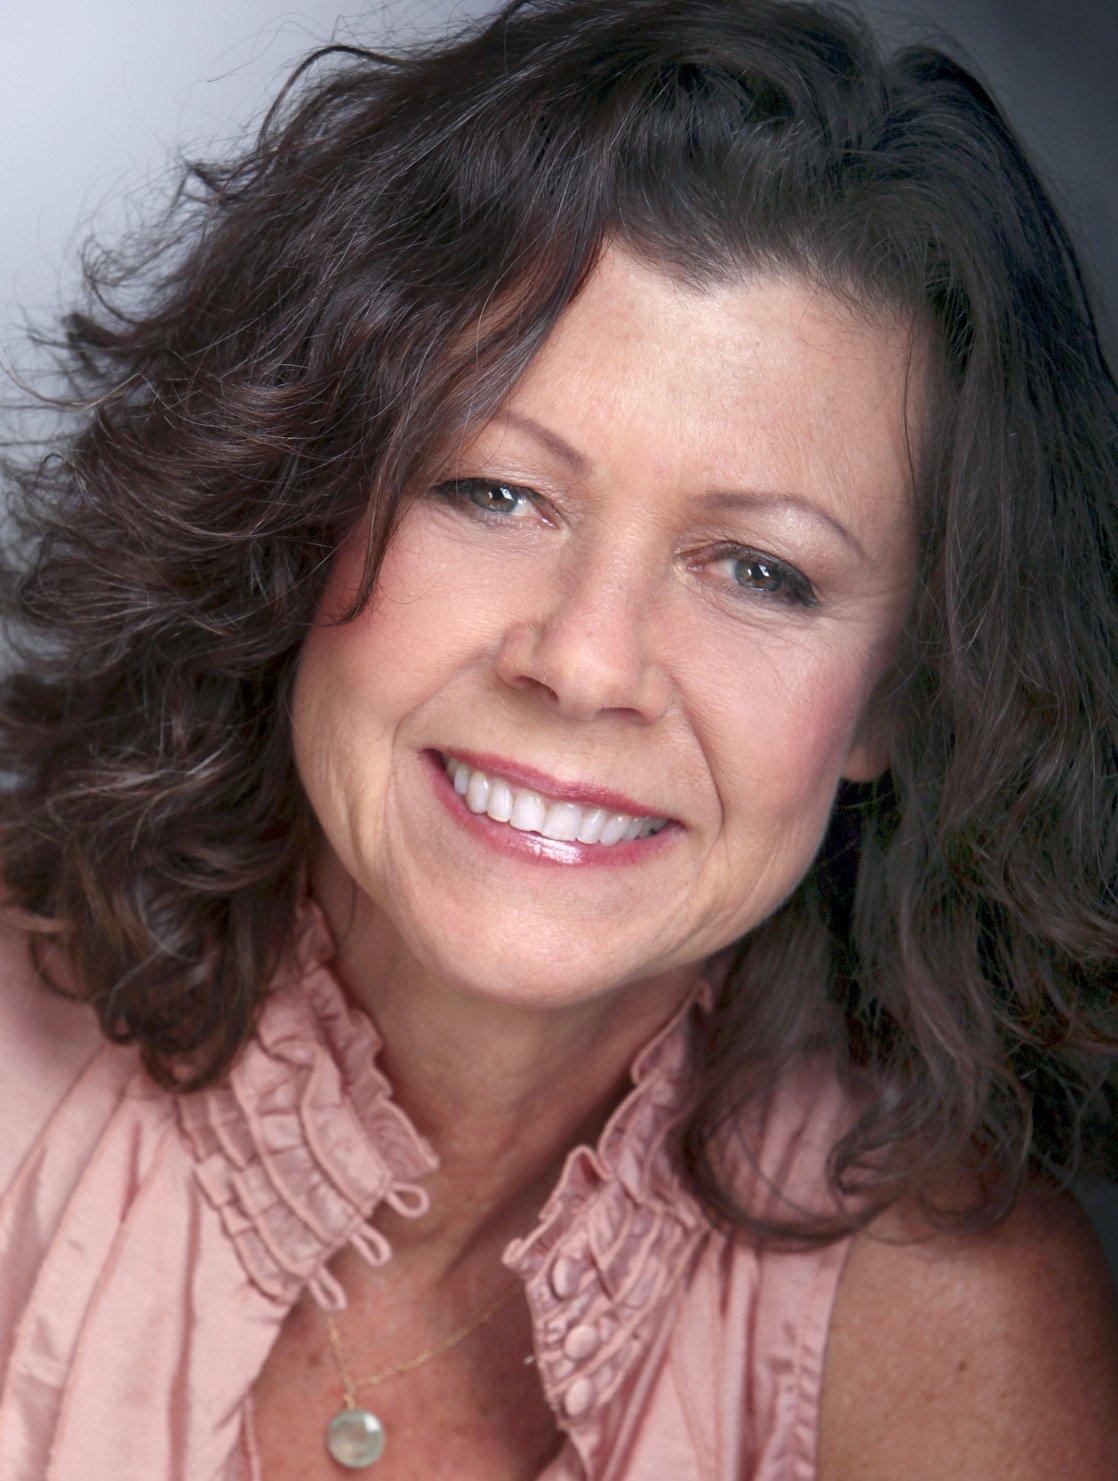 Christine M. Esters